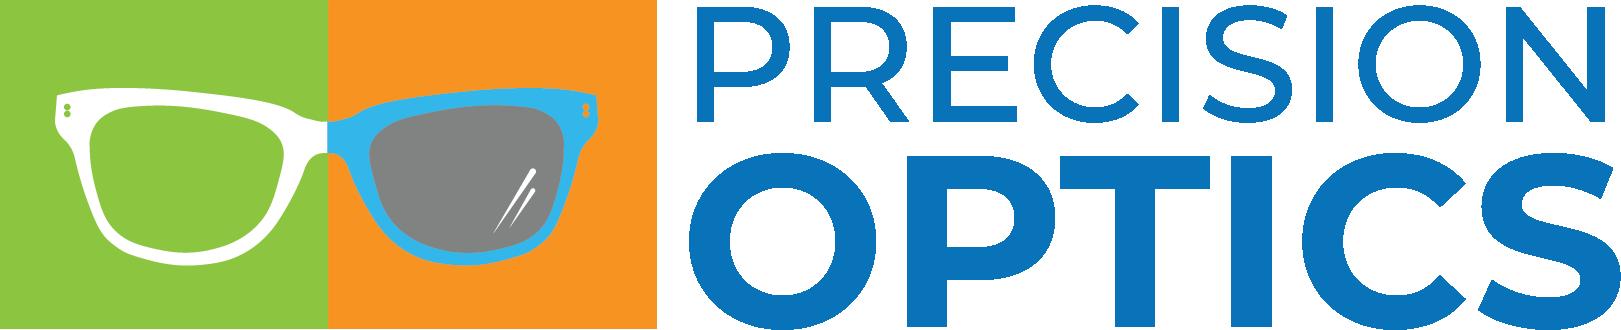 PrecisionOptics_horiz.png